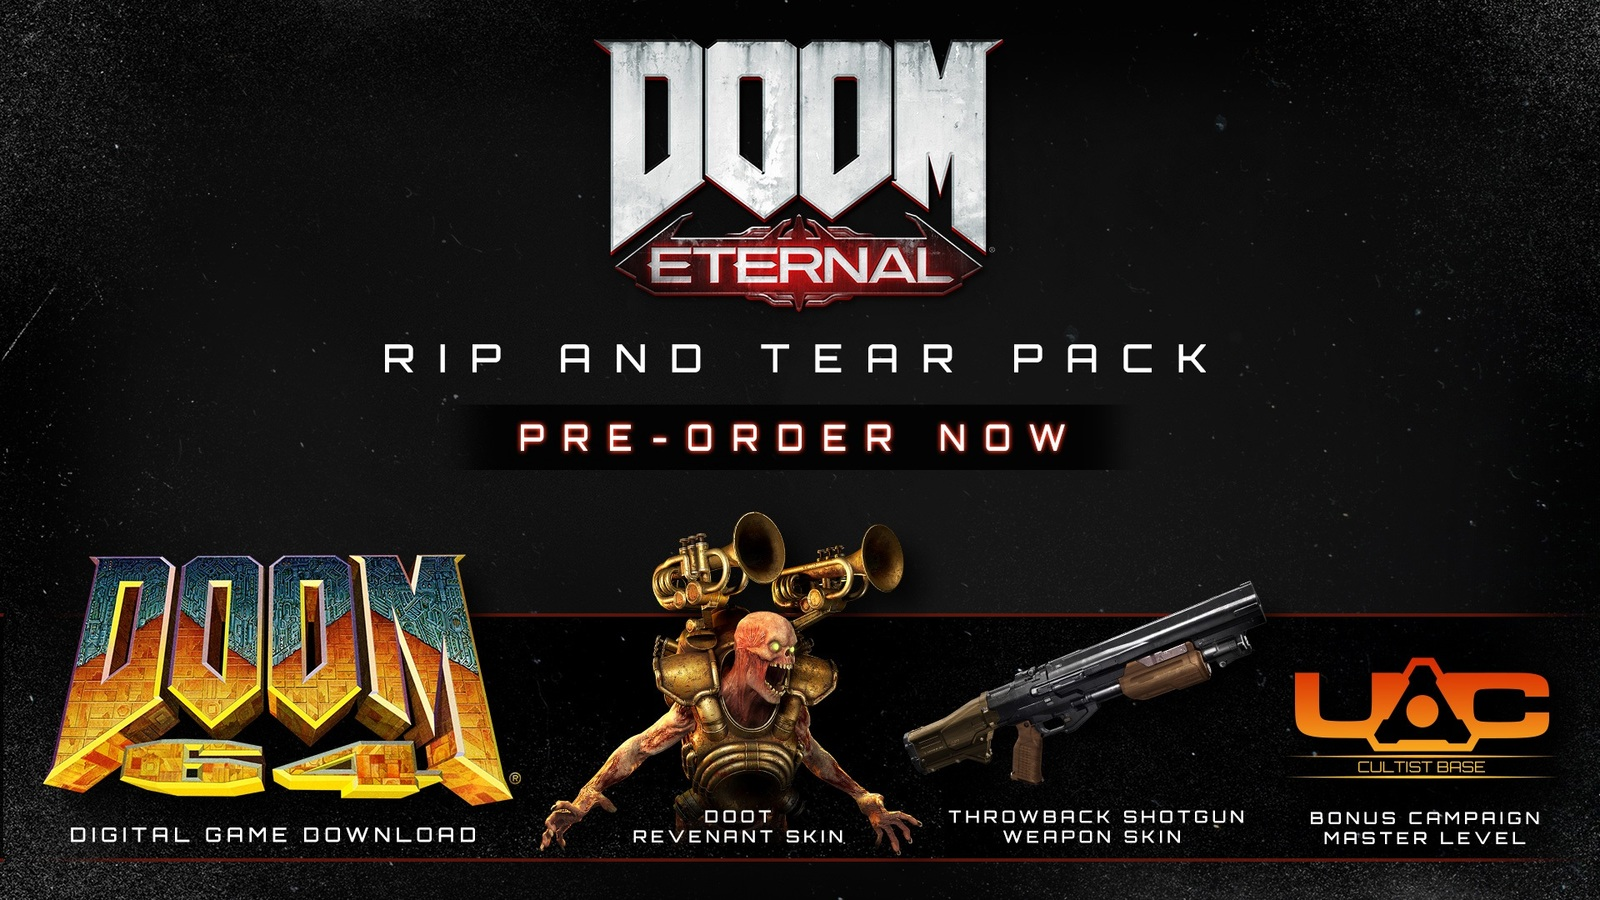 DOOM Eternal for PS4 image